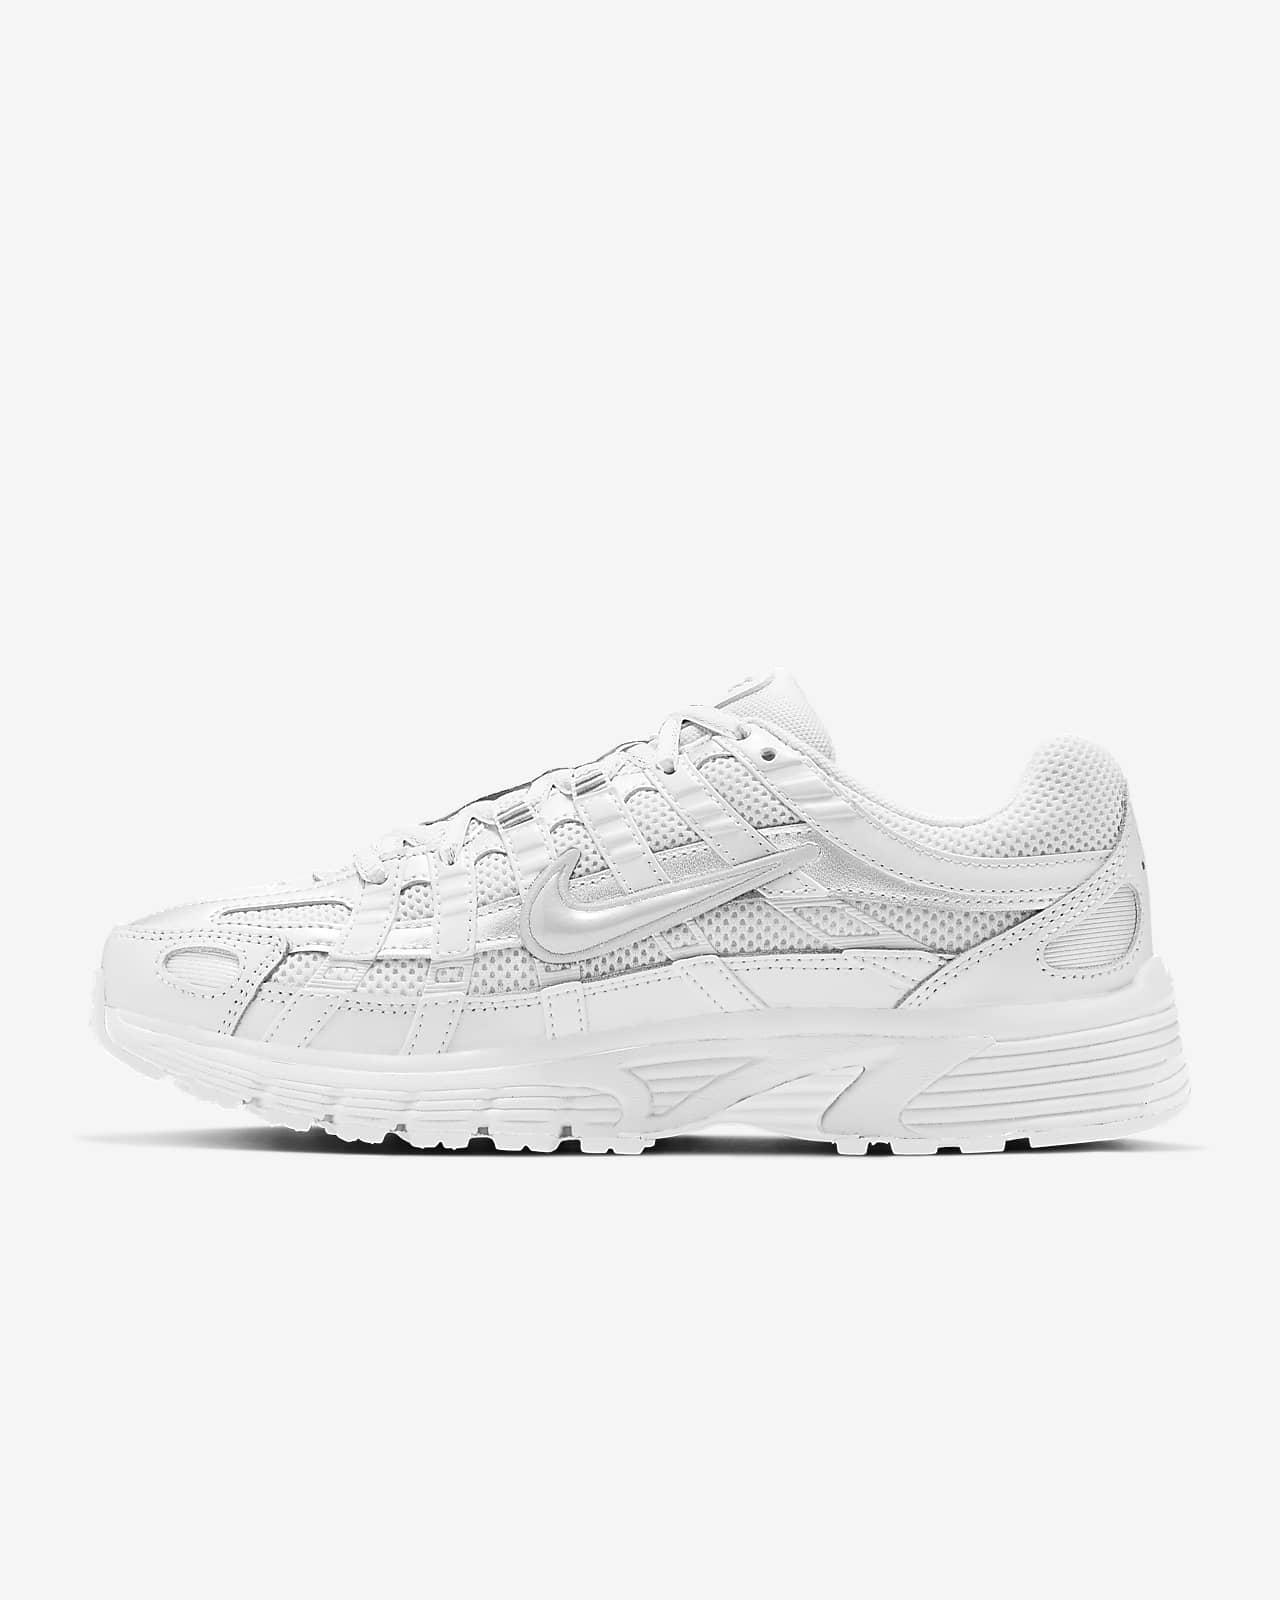 Treinta Polvo Representar  Nike P-6000 Shoe. Nike LU